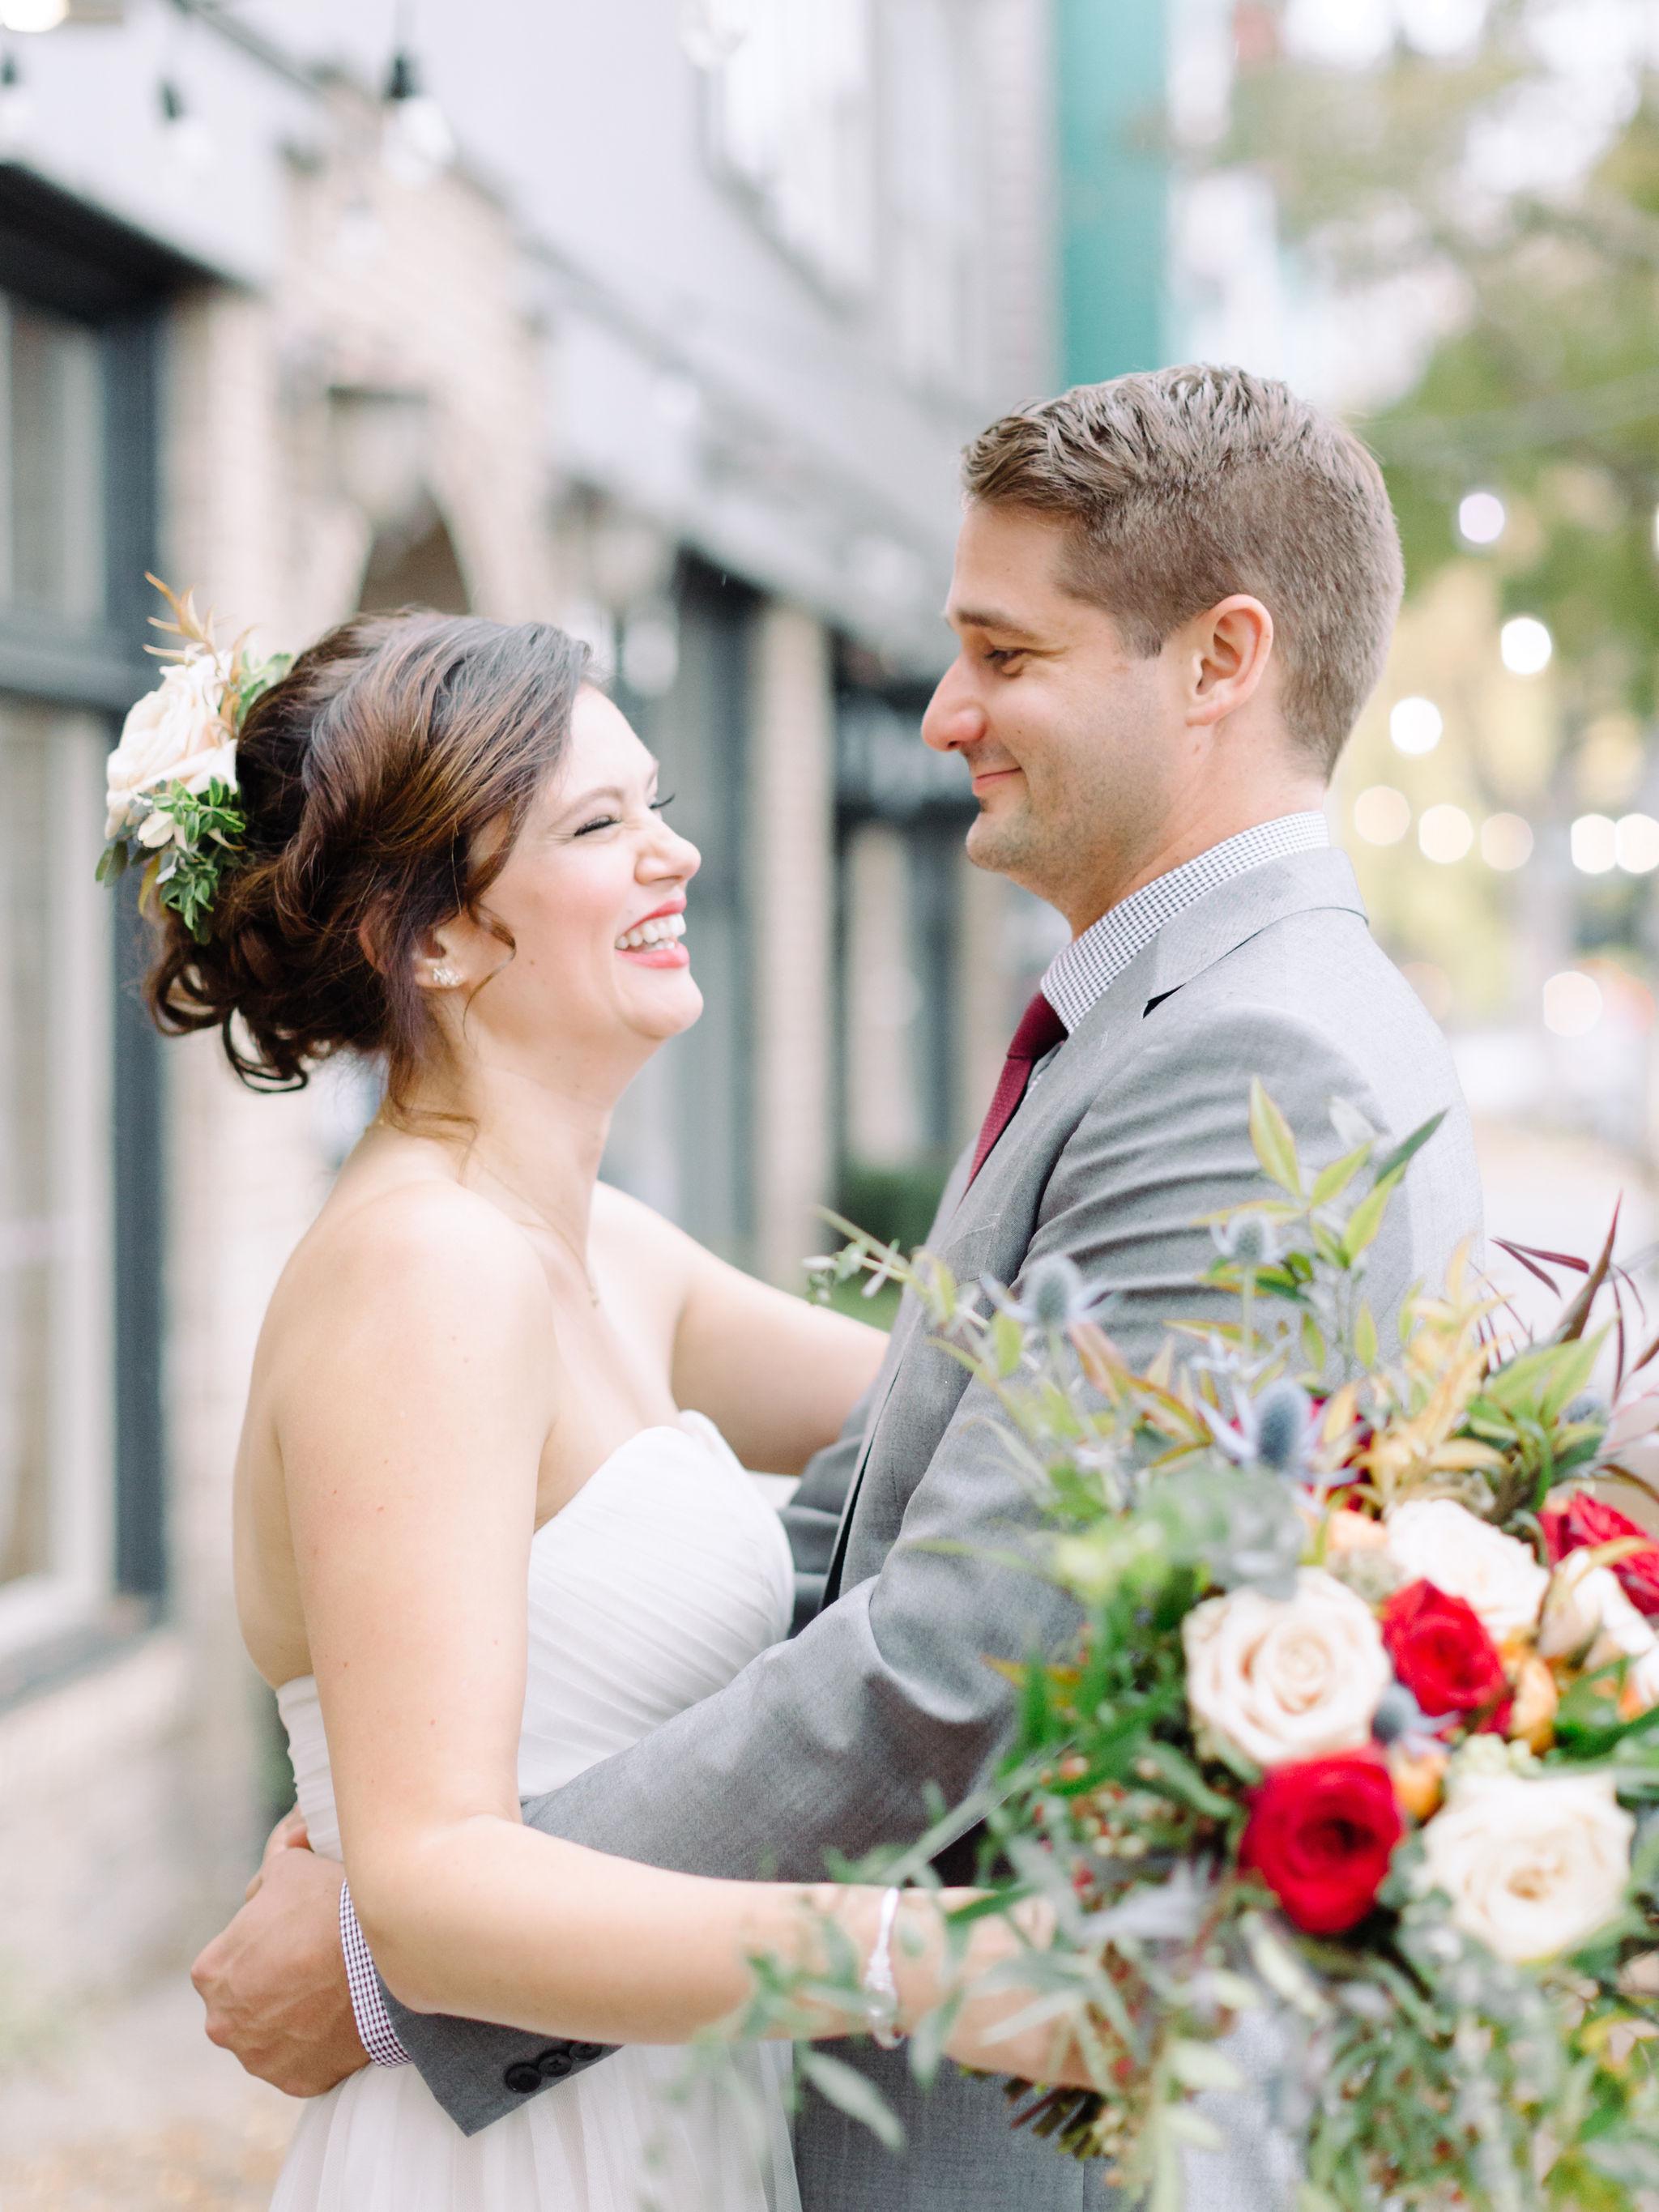 julie-and-adam-wedding-portraits-34.jpg